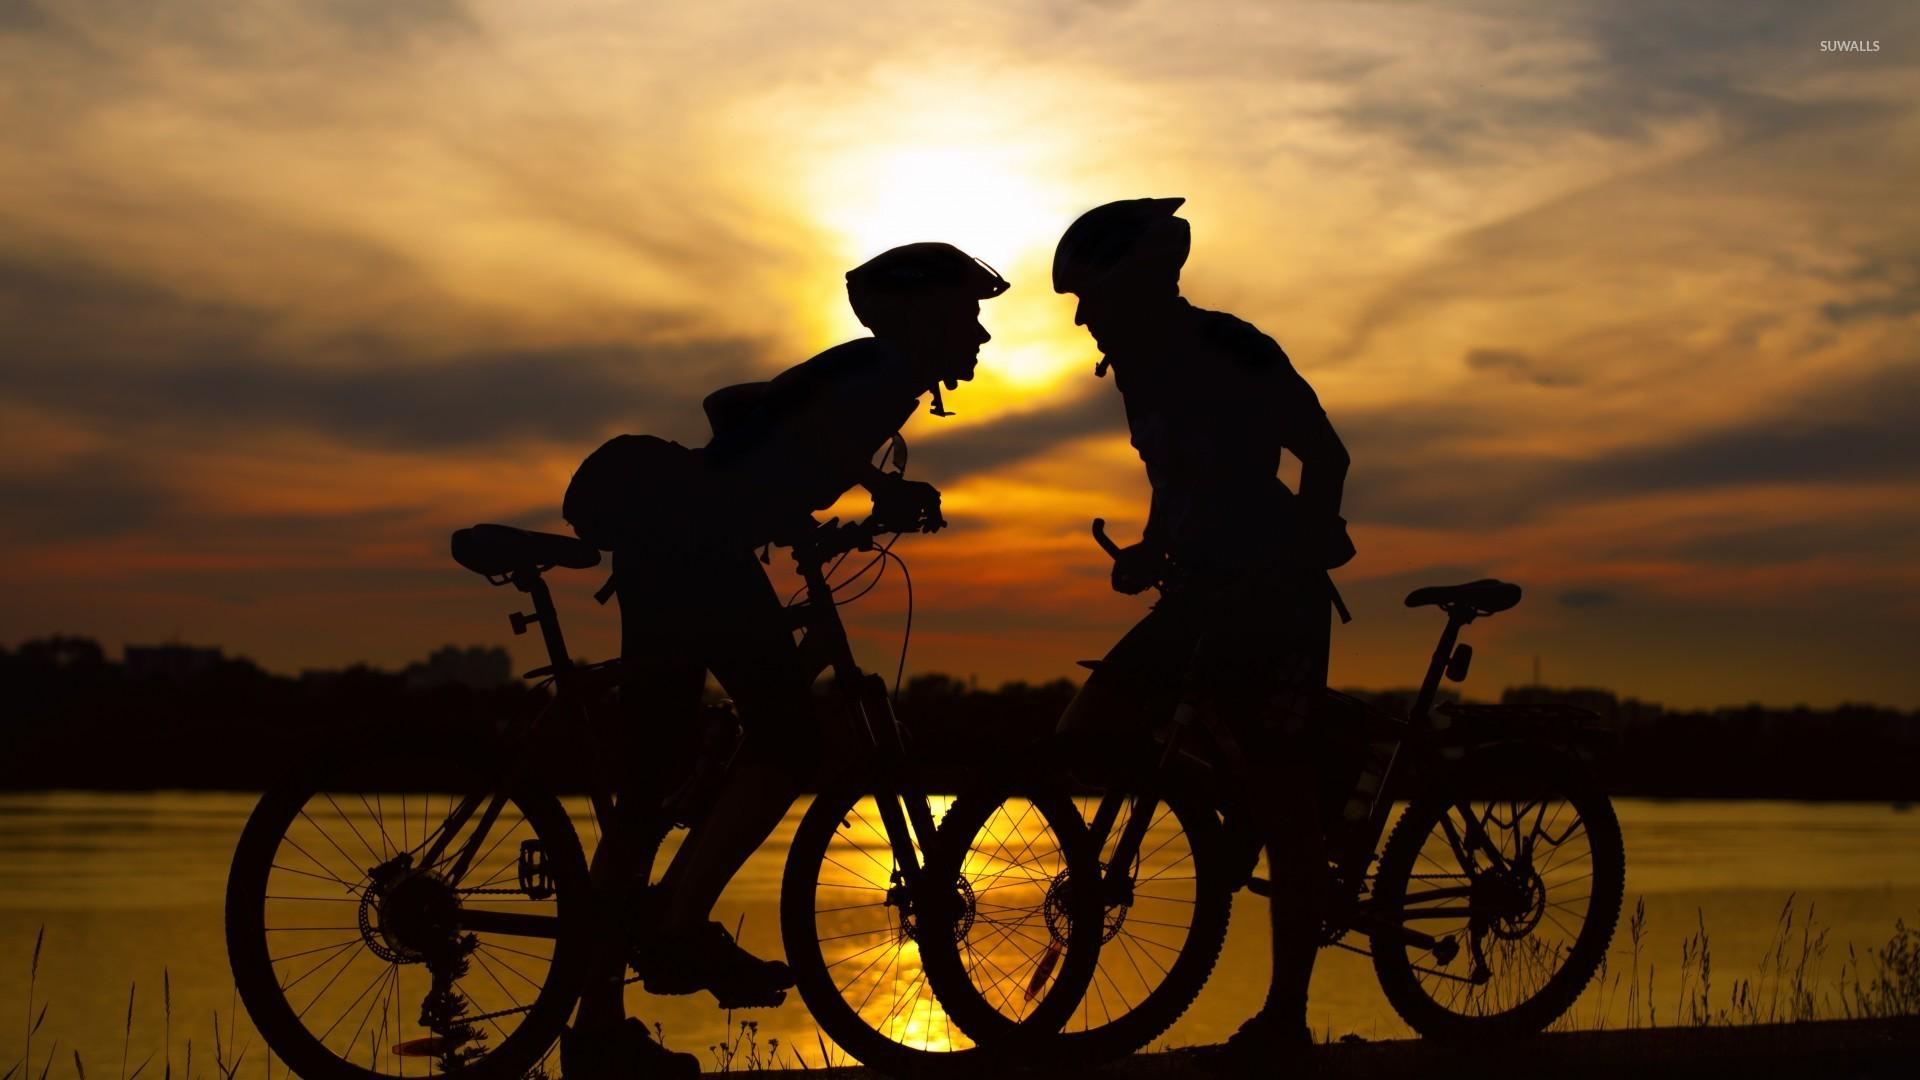 Sunset Bike Couple Wallpaper